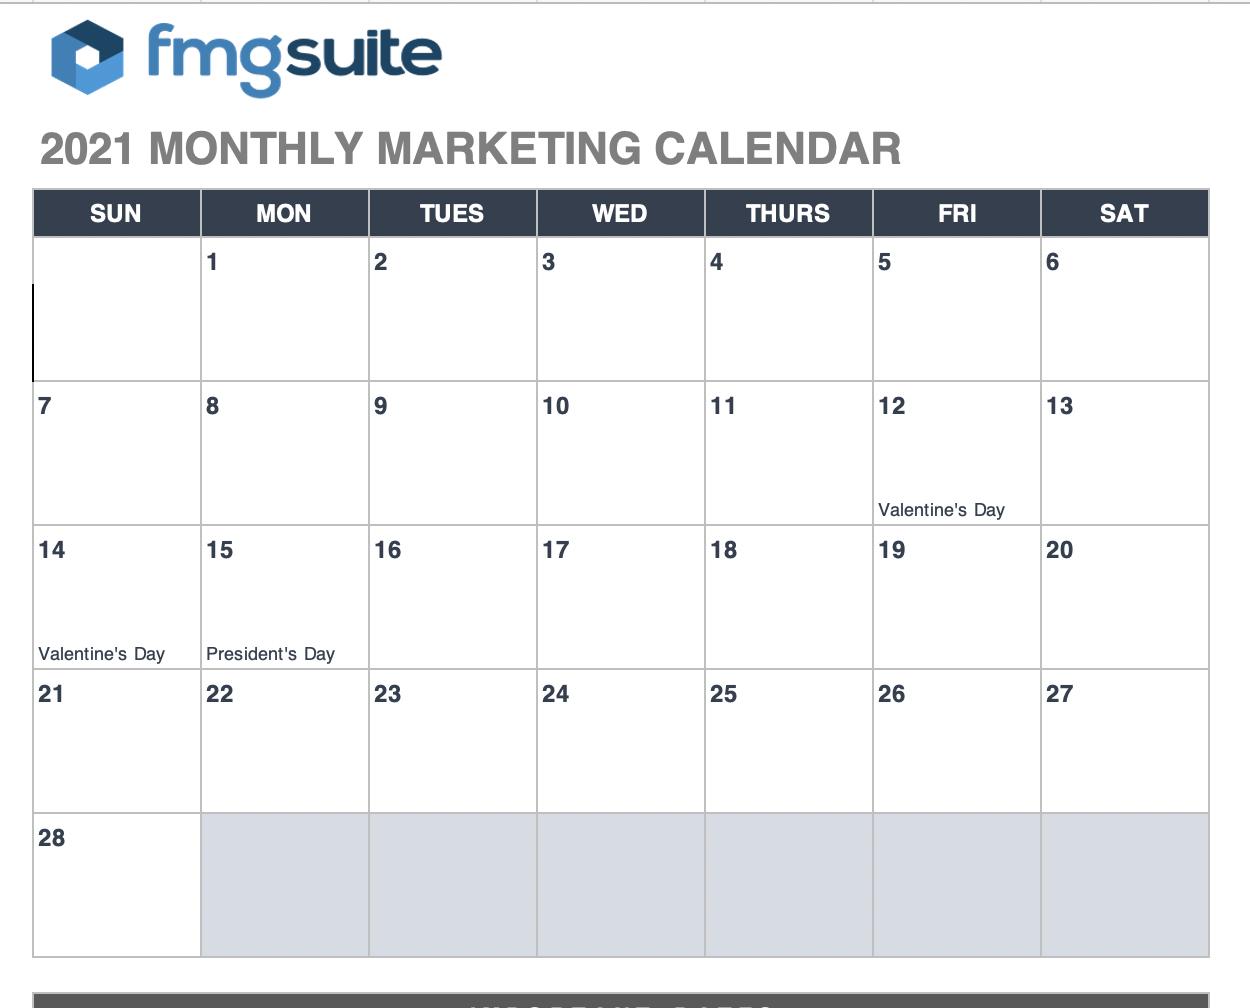 FMG Suite Editorial Calendar